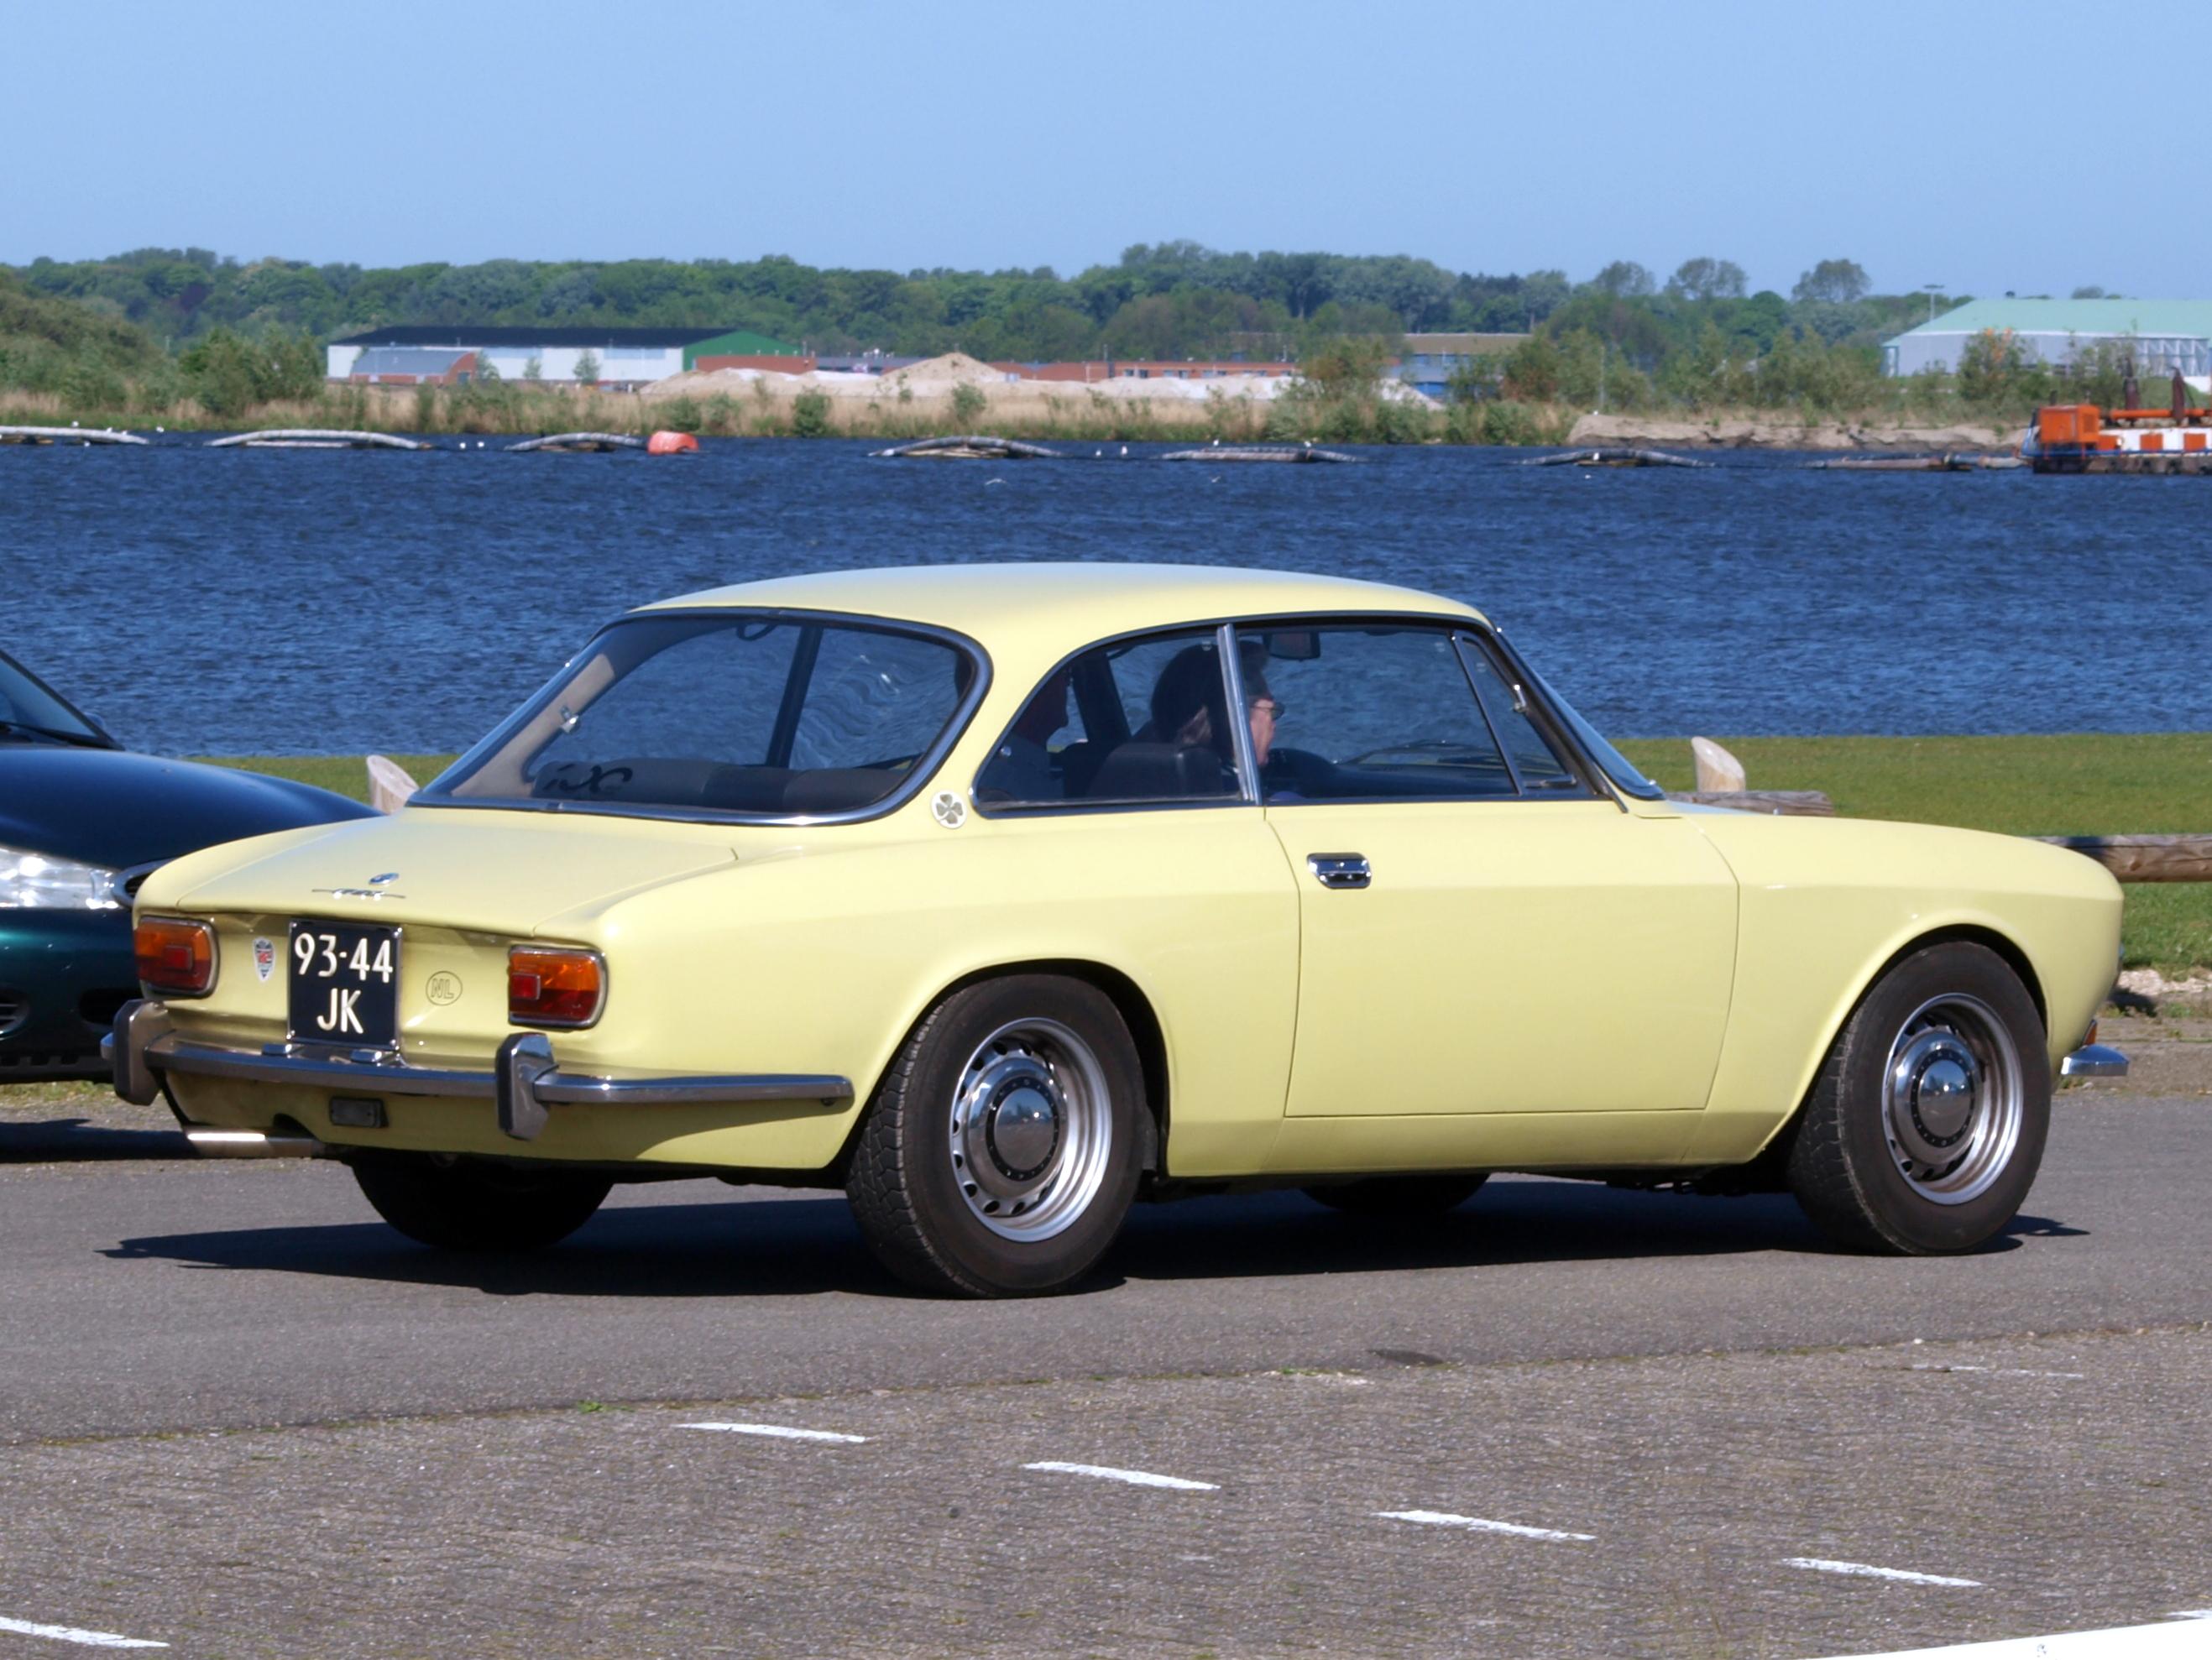 Alfa Romeo Wiki >> File:1969 Alfa Romeo 1750 GTV pic2.JPG - Wikimedia Commons